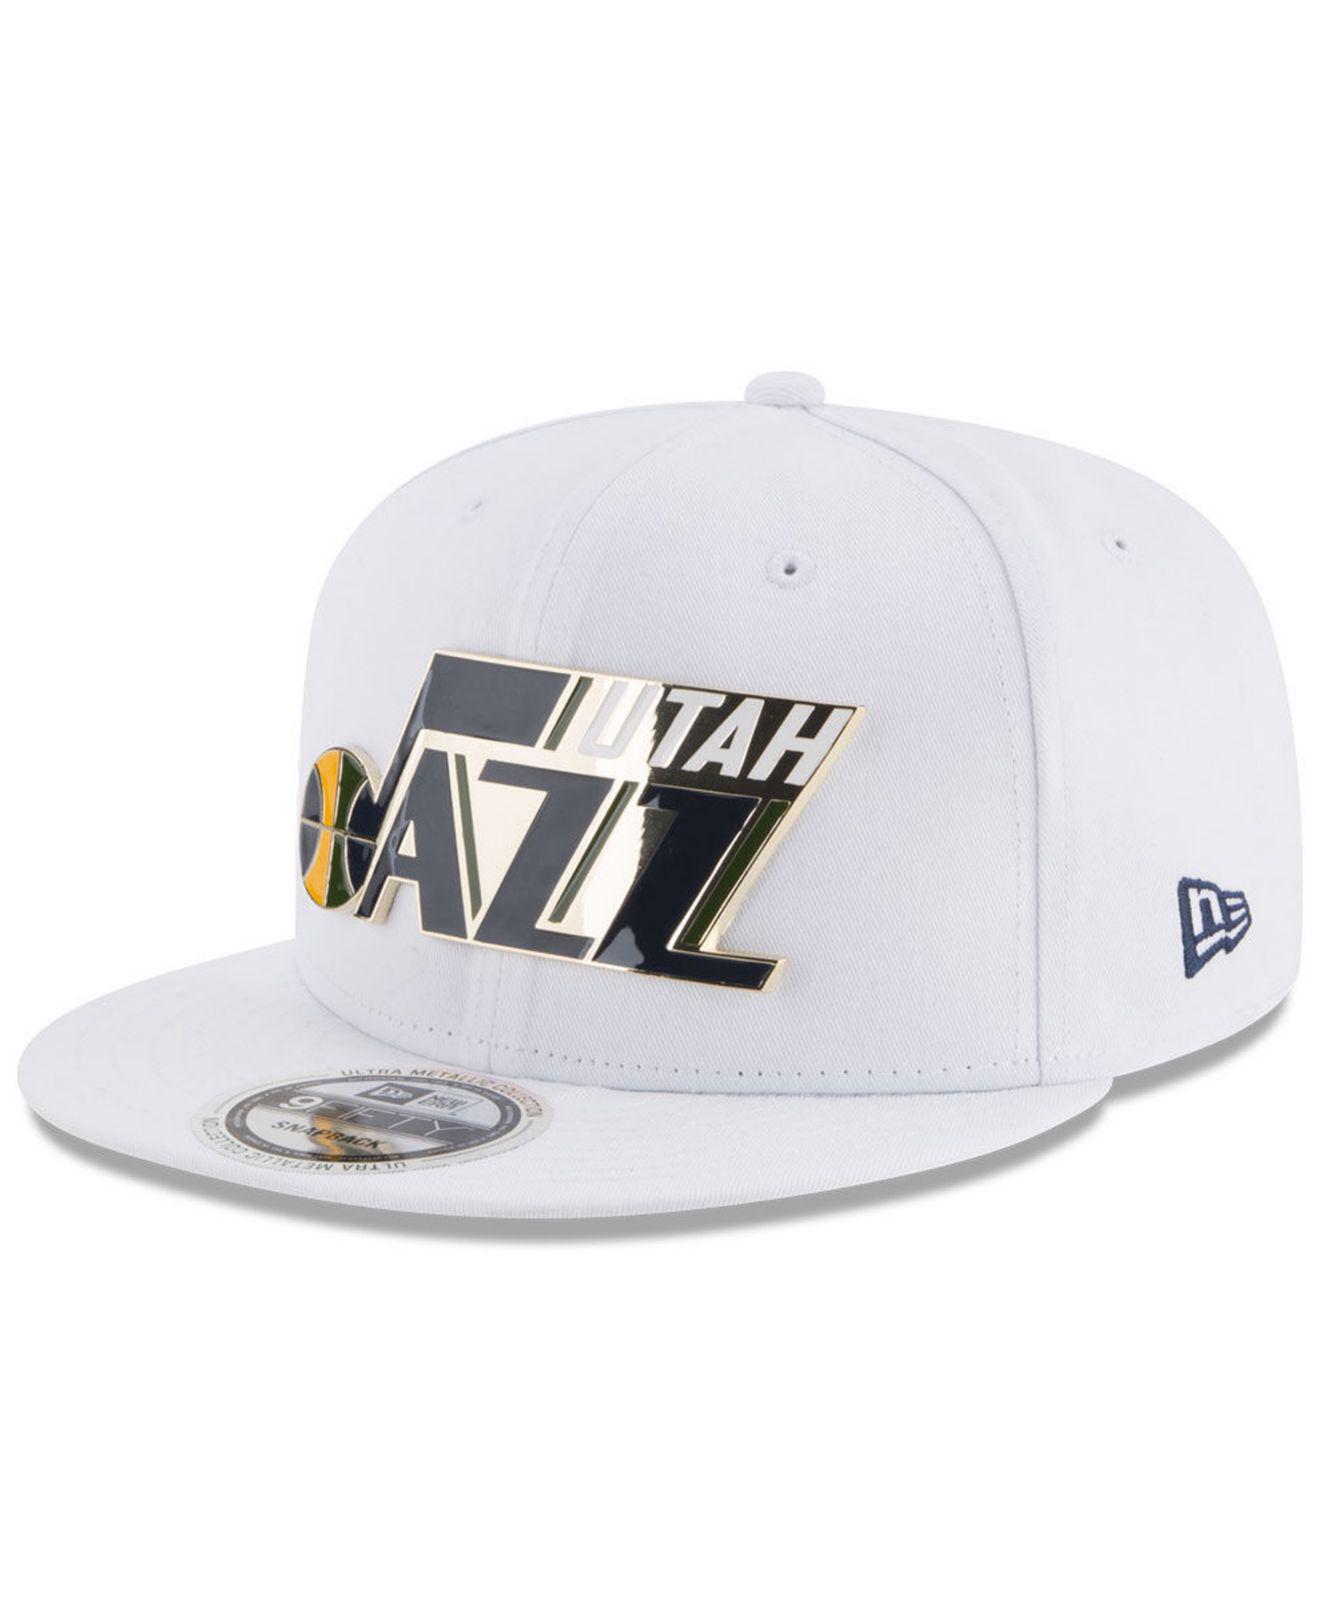 Lyst - KTZ Utah Jazz Enamel Badge 9fifty Snapback Cap in White for Men c23039507